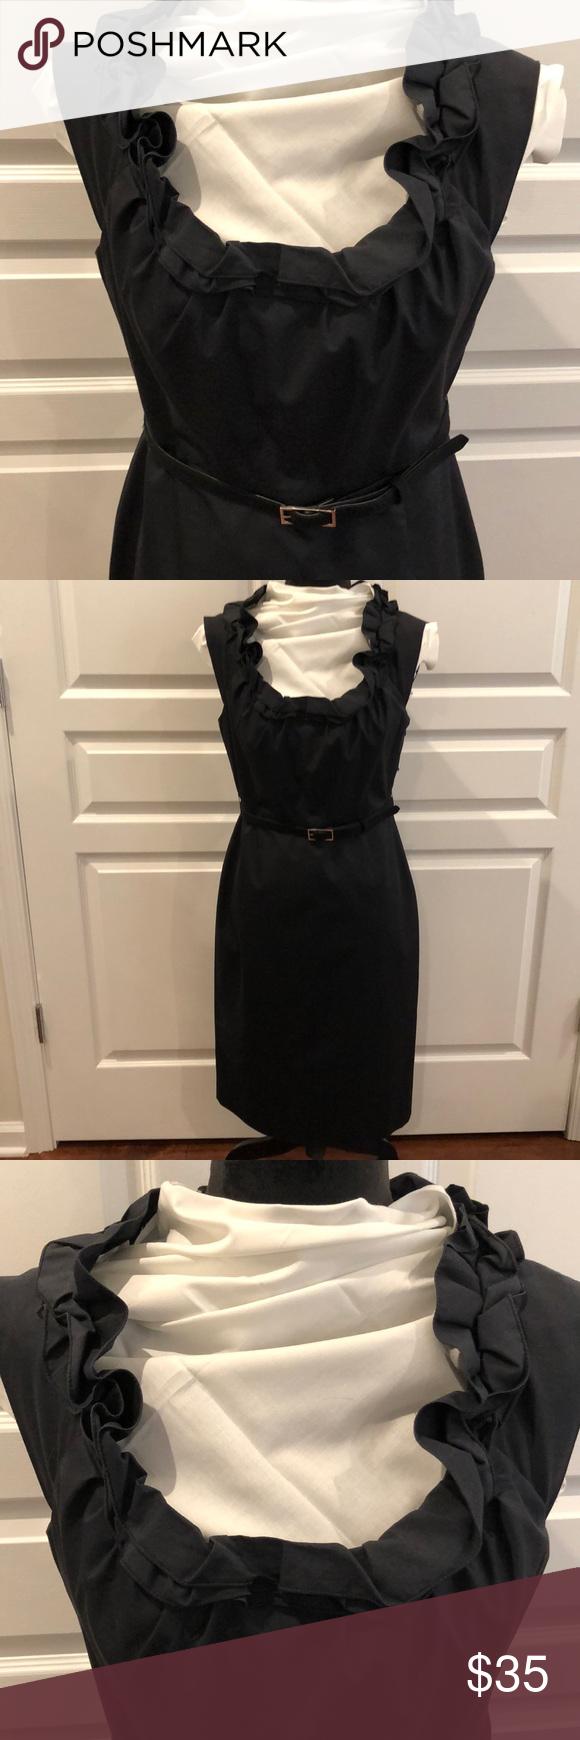 Elie Tahari Black Dress Black Dress Elie Tahari Elie Tahari Dresses [ 1740 x 580 Pixel ]